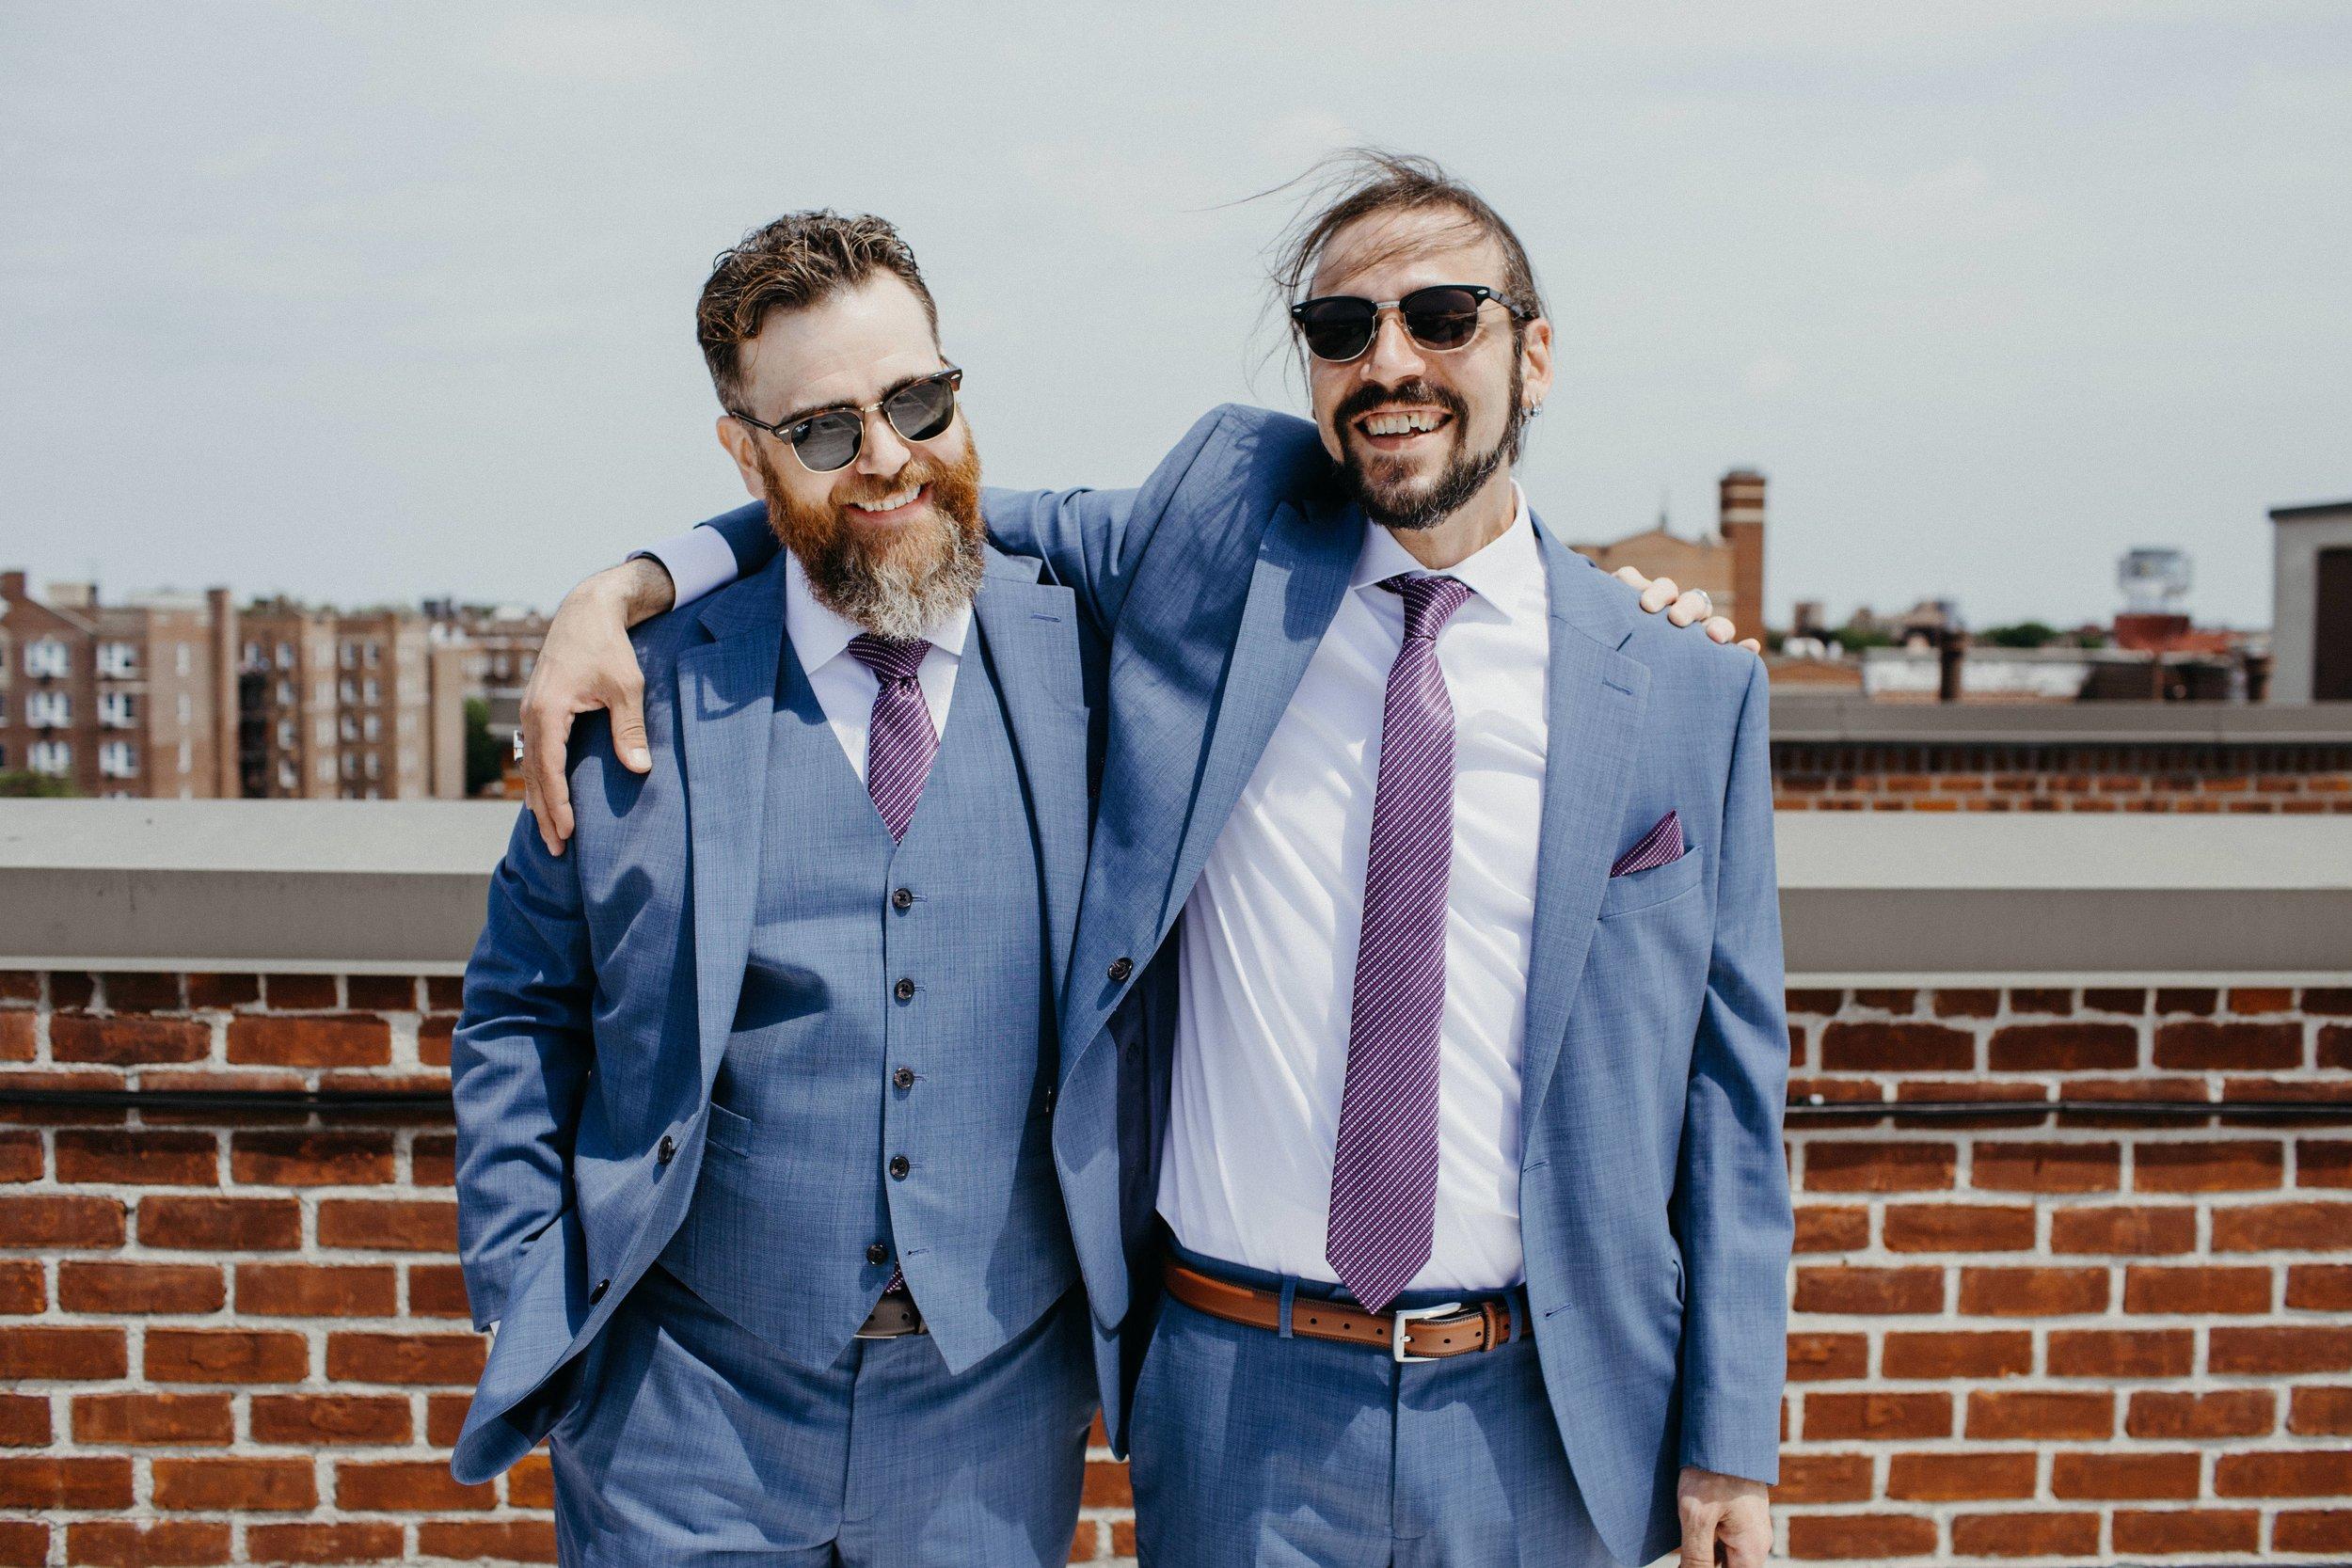 Sevlynn-Photography-Wedding-LIC-Landing-Maiella-NYC-16.jpg